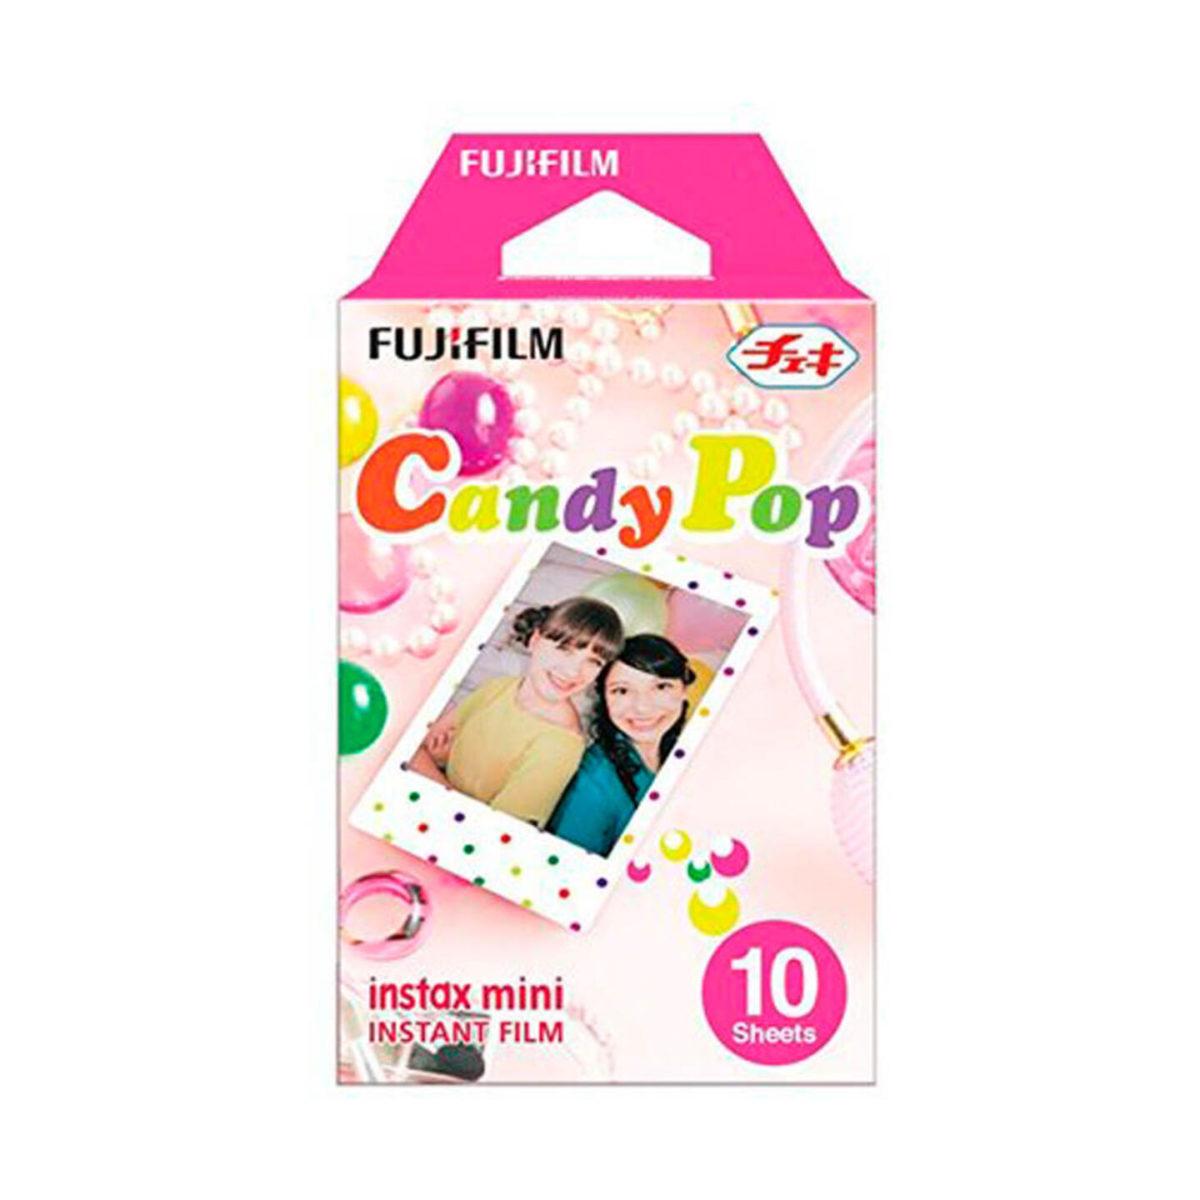 fujifilm_instax_mini_candypop_01